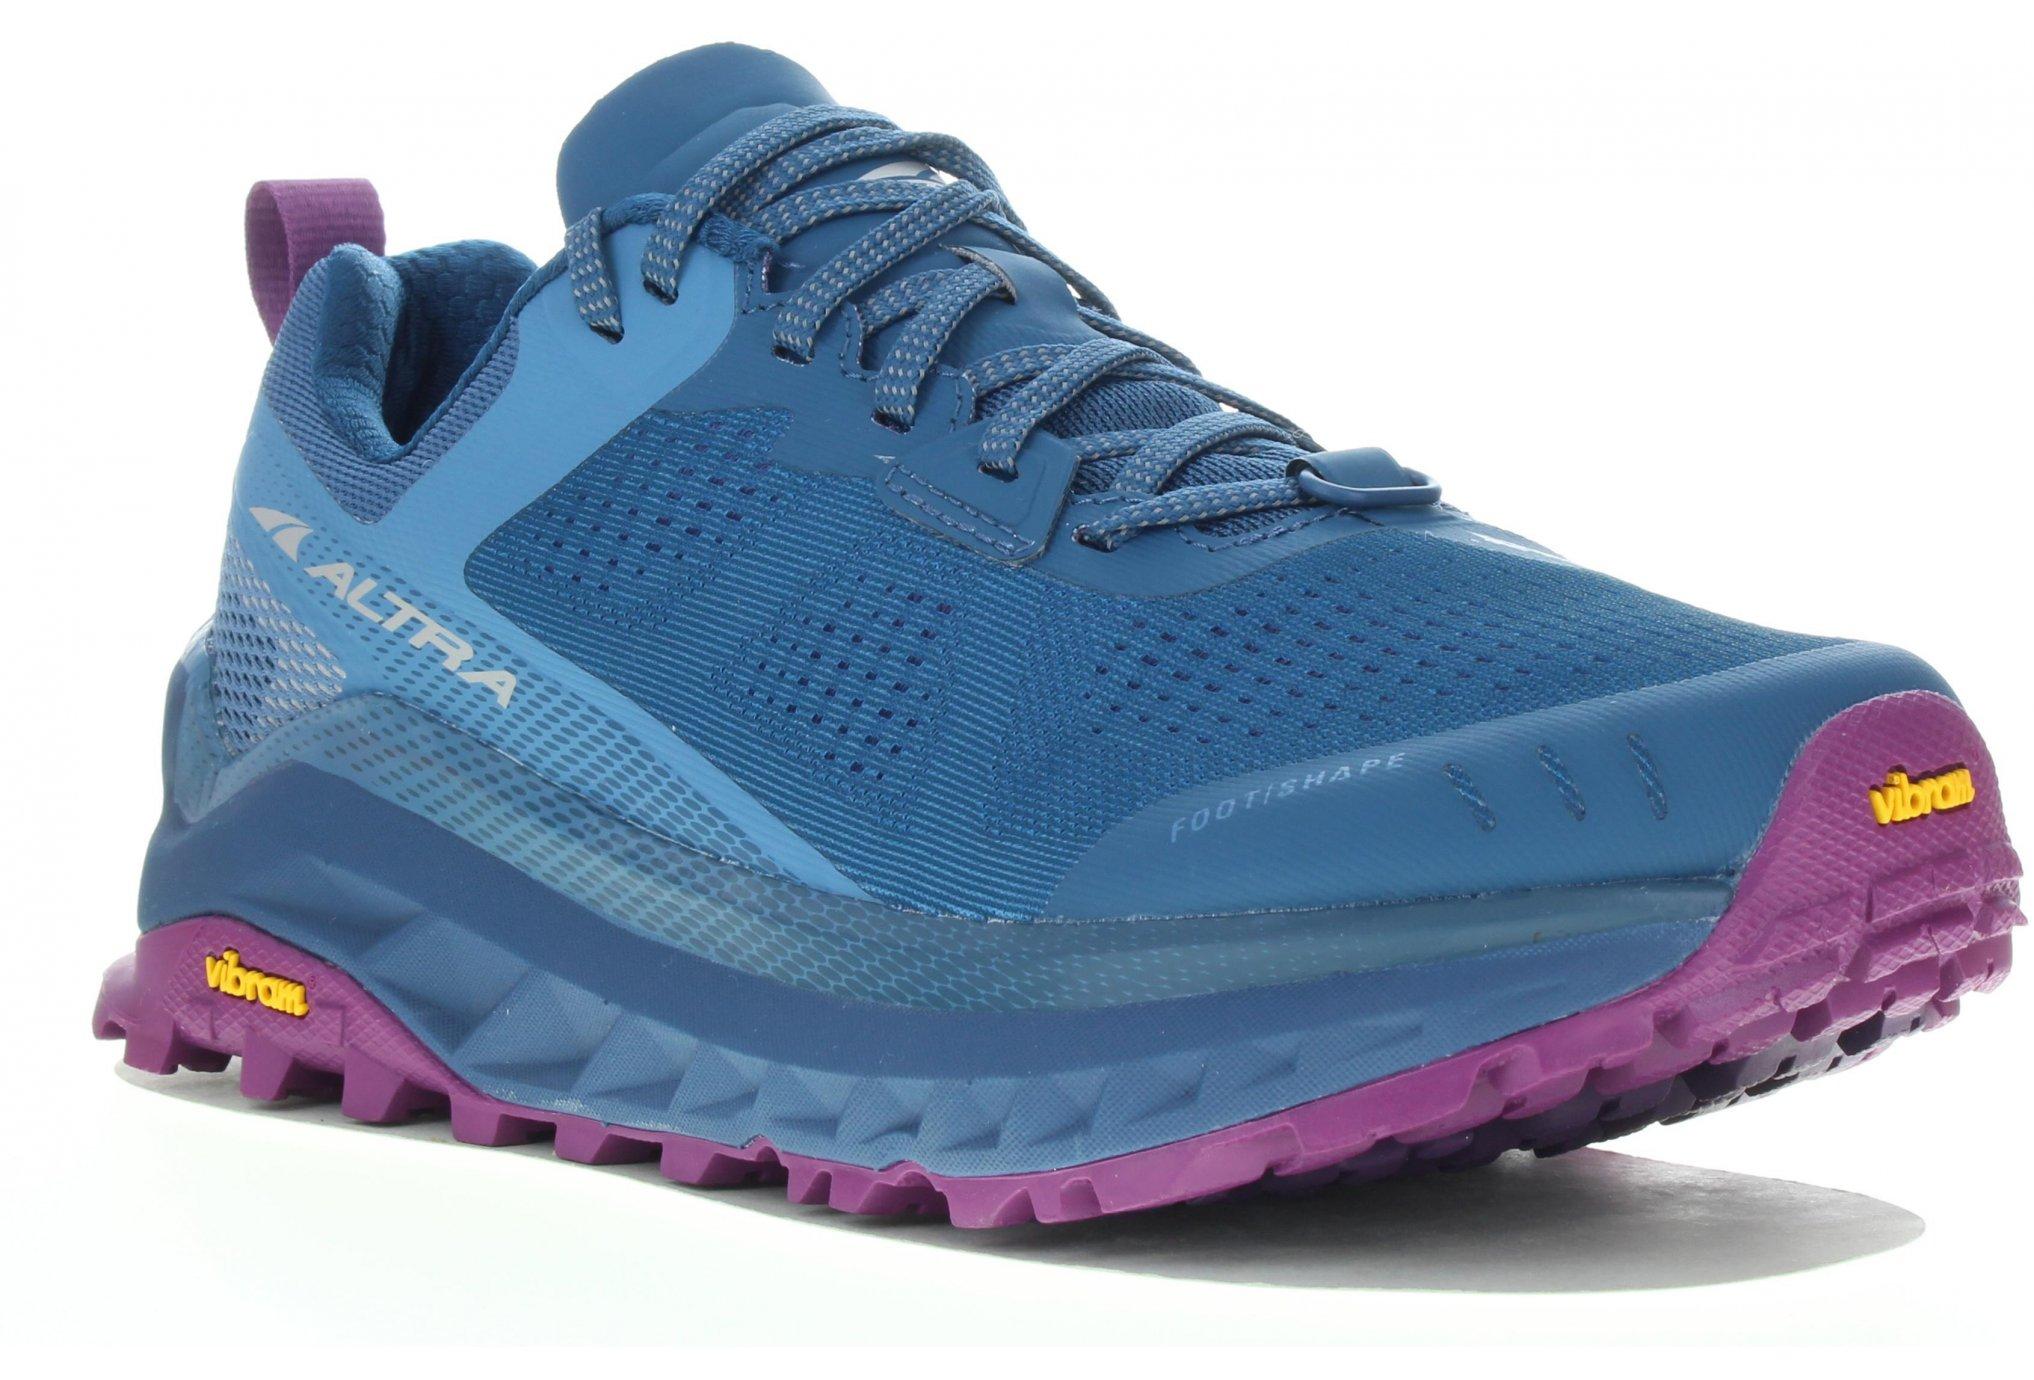 Altra Olympus 4 Chaussures running femme